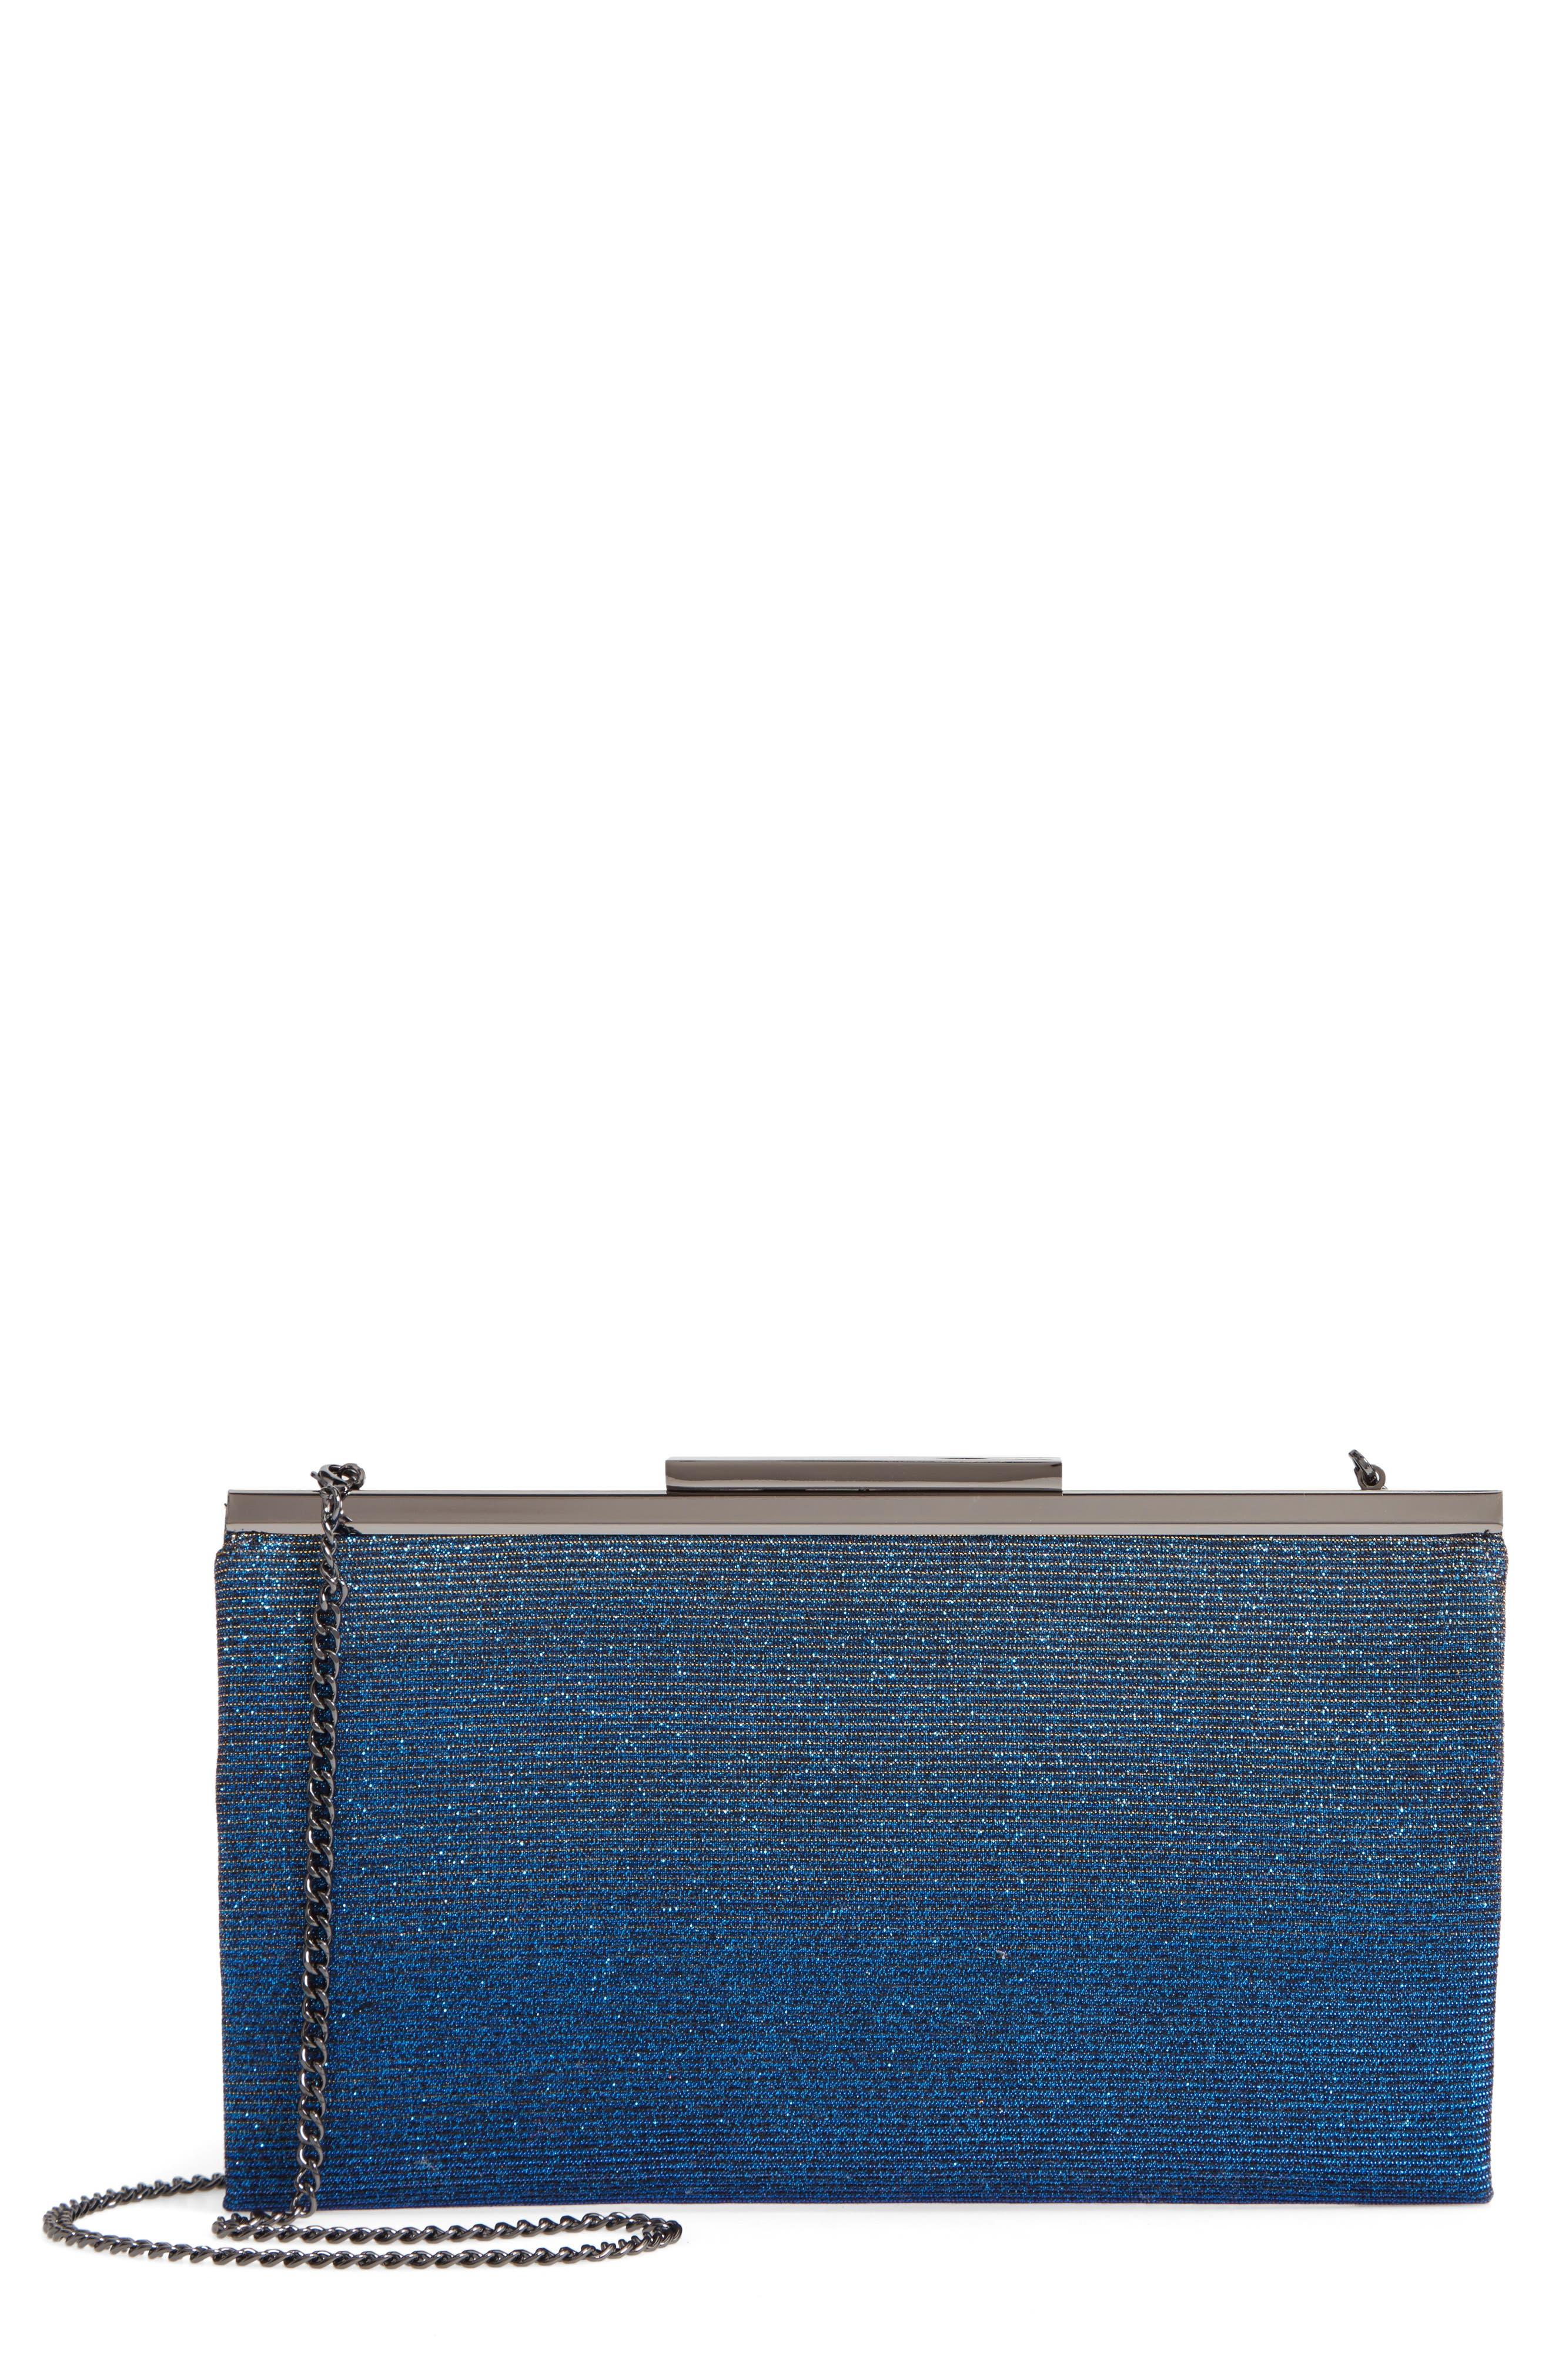 NORDSTROM Glitter Clutch, Main, color, BLUE